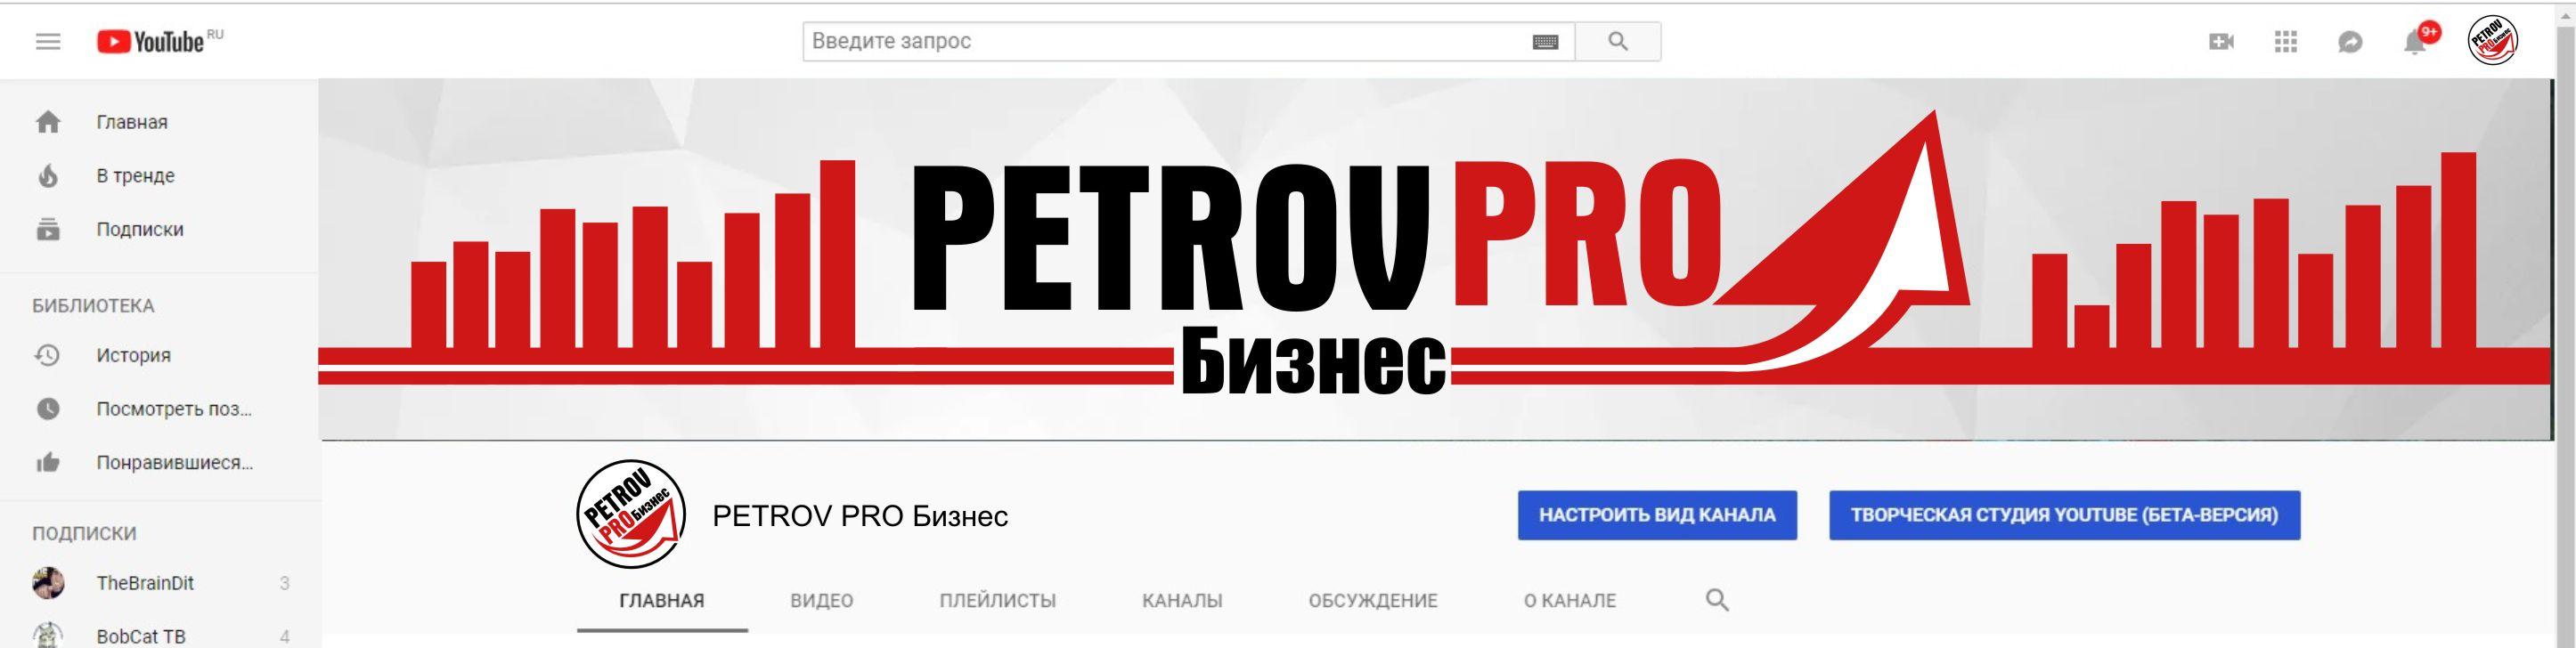 Создать логотип для YouTube канала  фото f_0255c0102461e31e.jpg